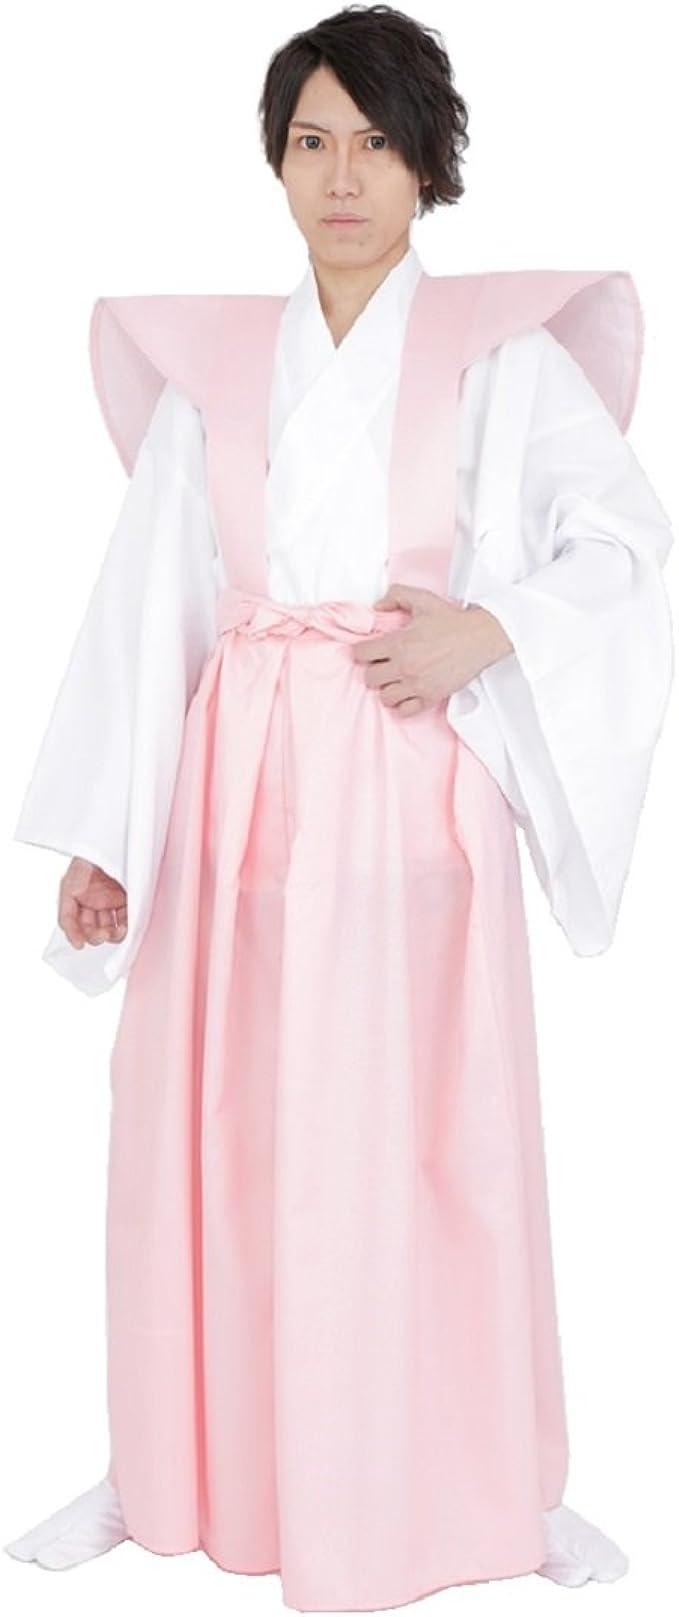 Amazon.com: patymo Cruz vestido japonés – disfraz rosa ...